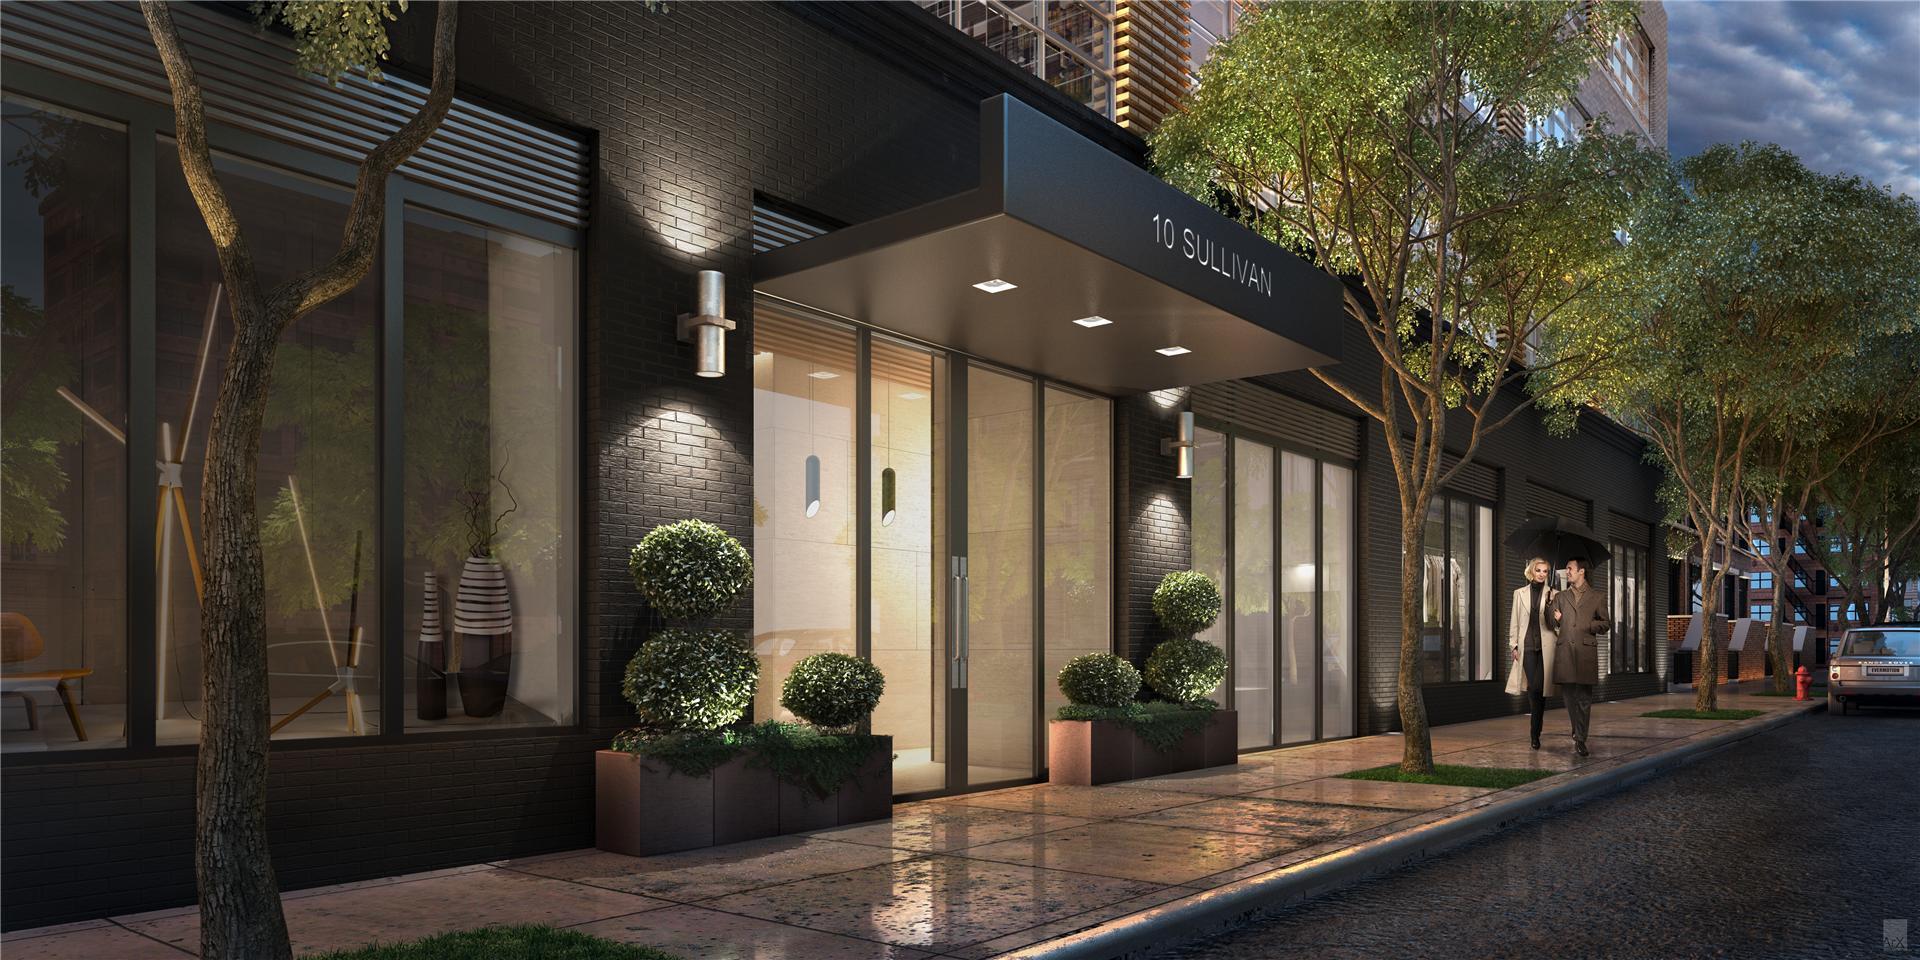 Condominium for Sale at 10 Sullivan Street New York, New York 10012 United States